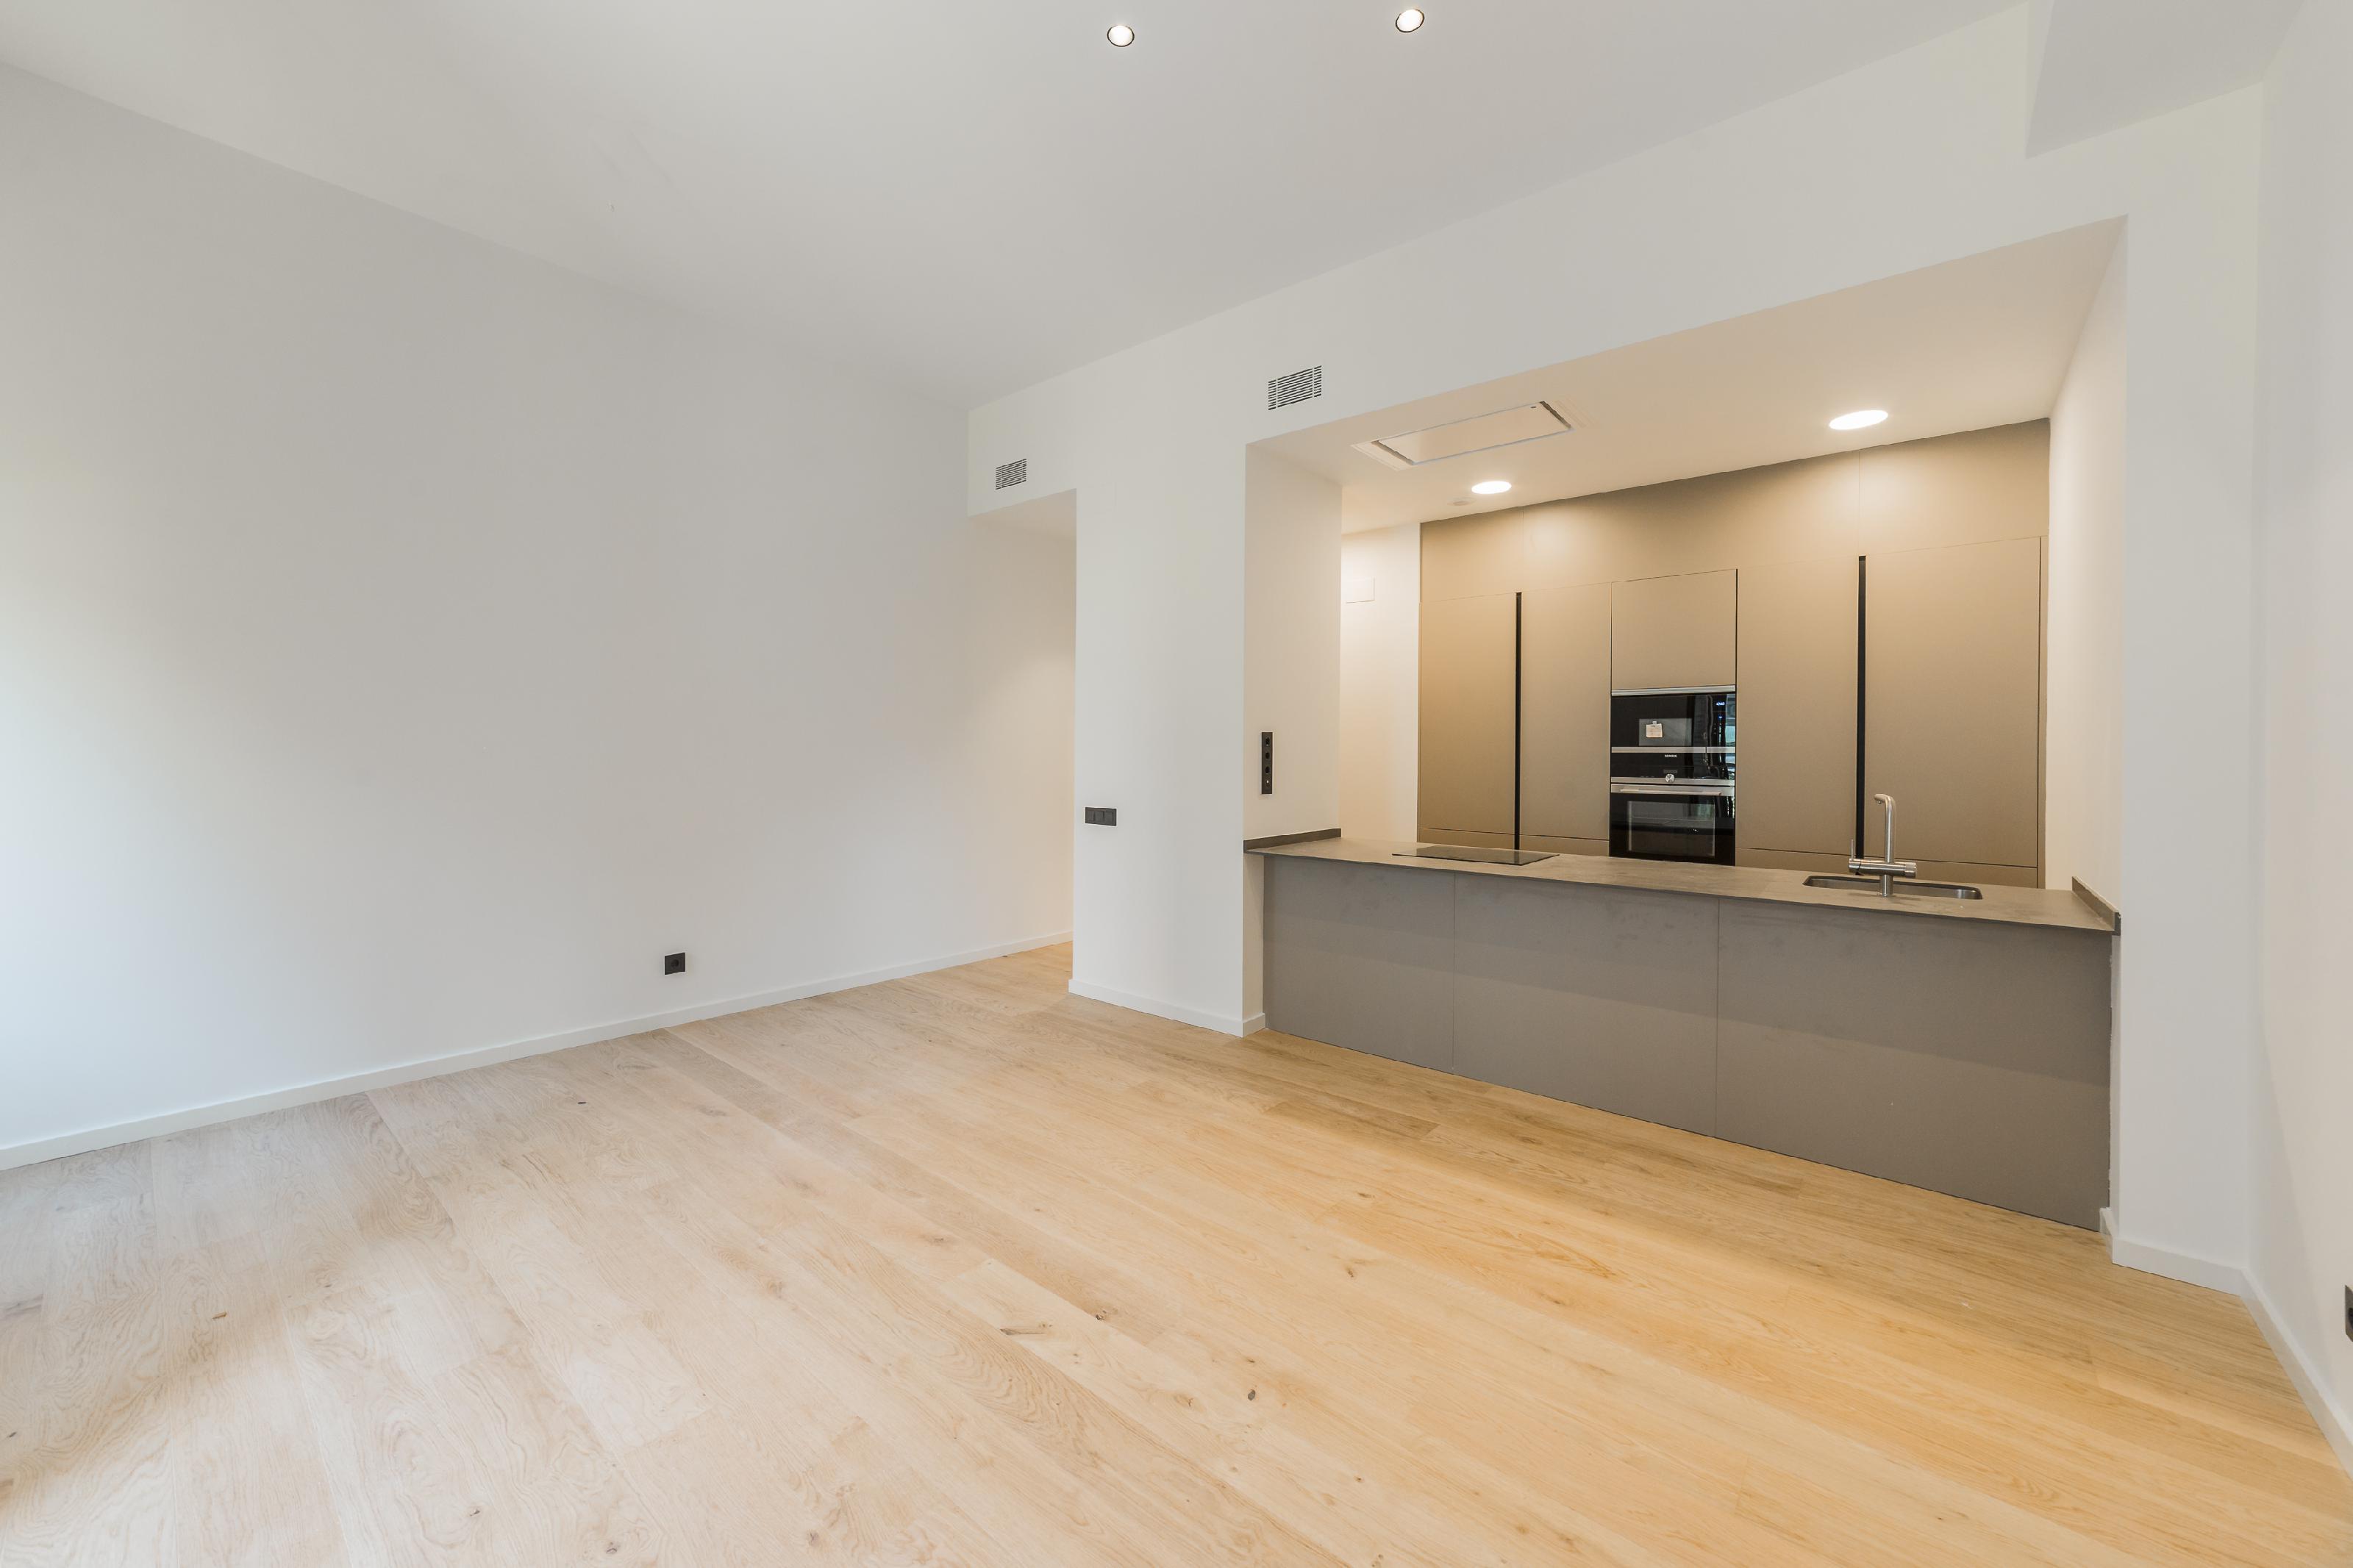 182456 Apartamento en venda en Eixample, Antiga Esquerre Eixample 1